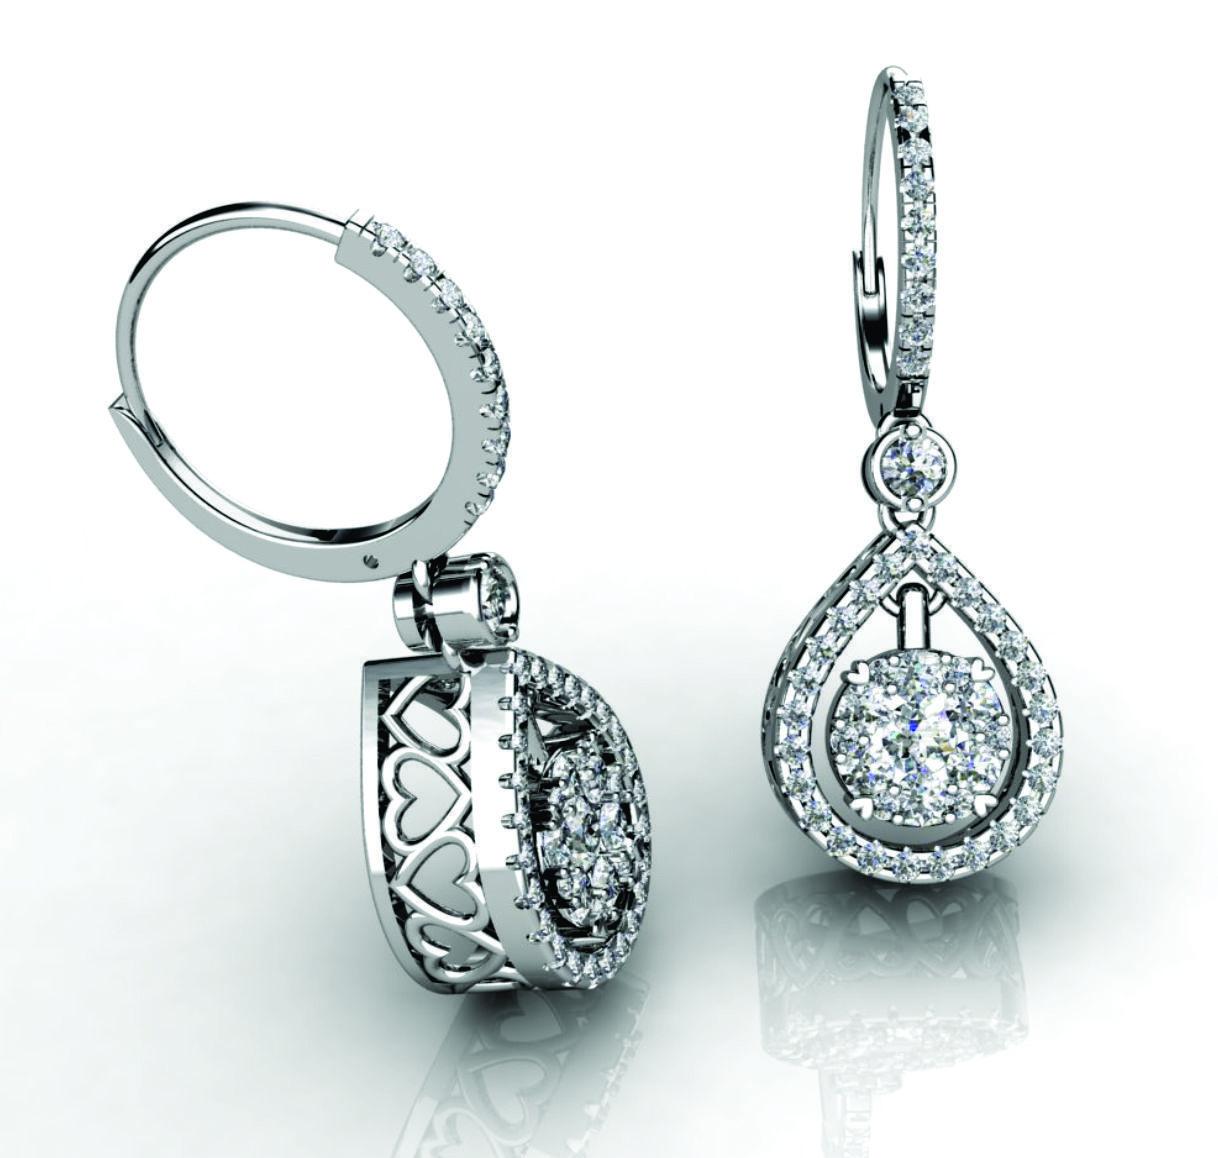 Designing A Custom Diamond Earrings 18karat Diamond Ring Jewelry Whitegold Engagement Bridal Wedding Kimphuoc Diamond White Gold Earrings